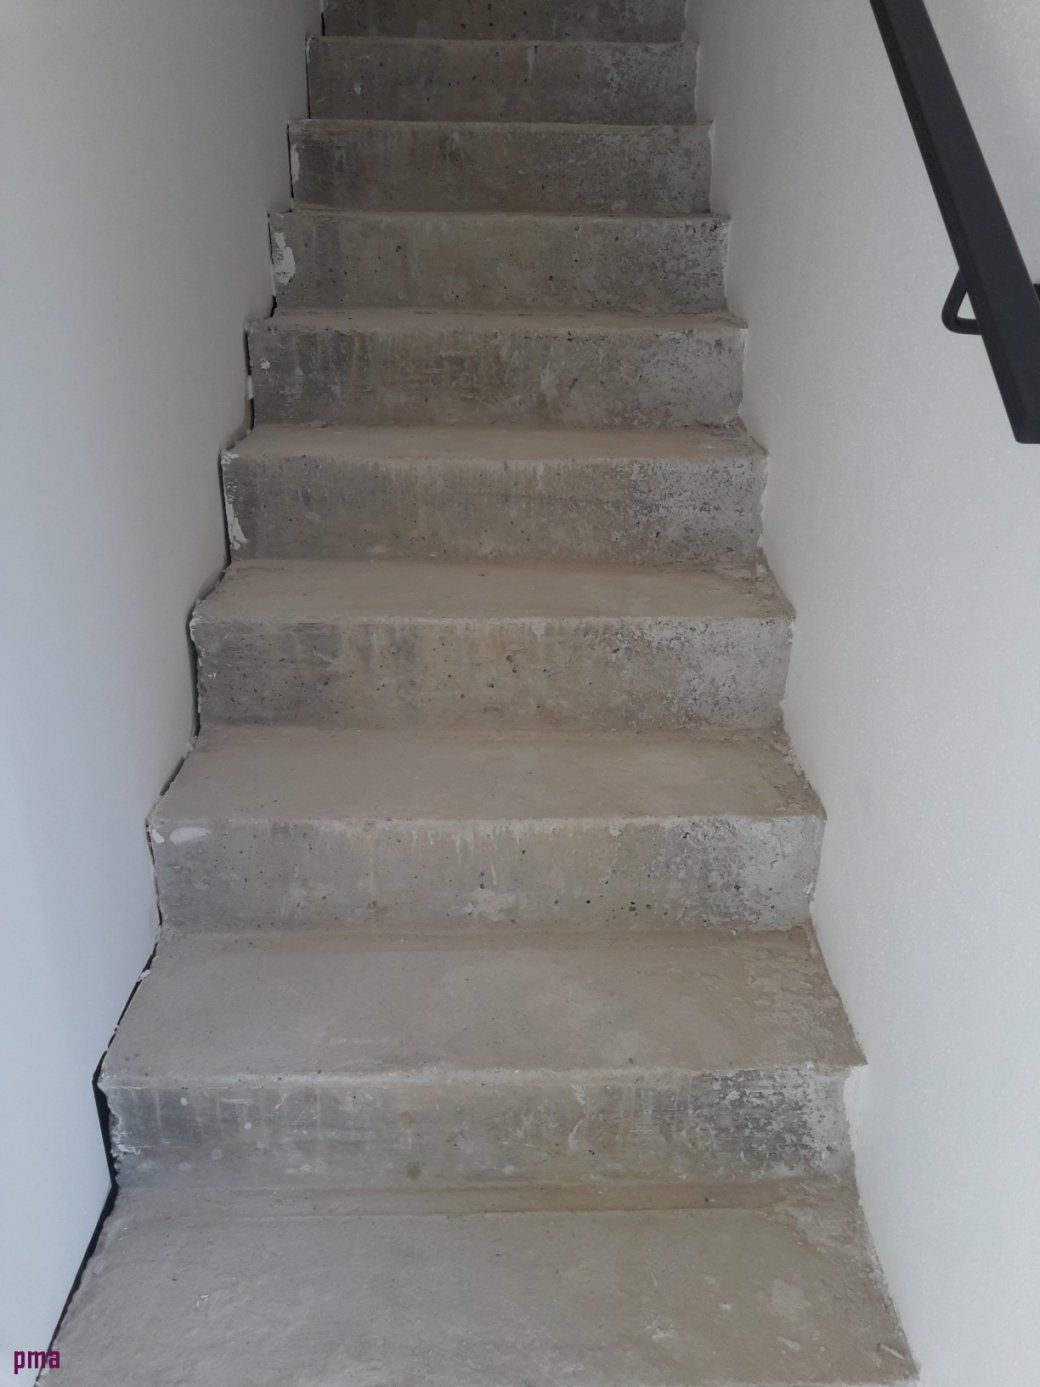 laminat an treppen verlegen best verkleiden sie ihre treppe mit laminat with laminat an treppen. Black Bedroom Furniture Sets. Home Design Ideas